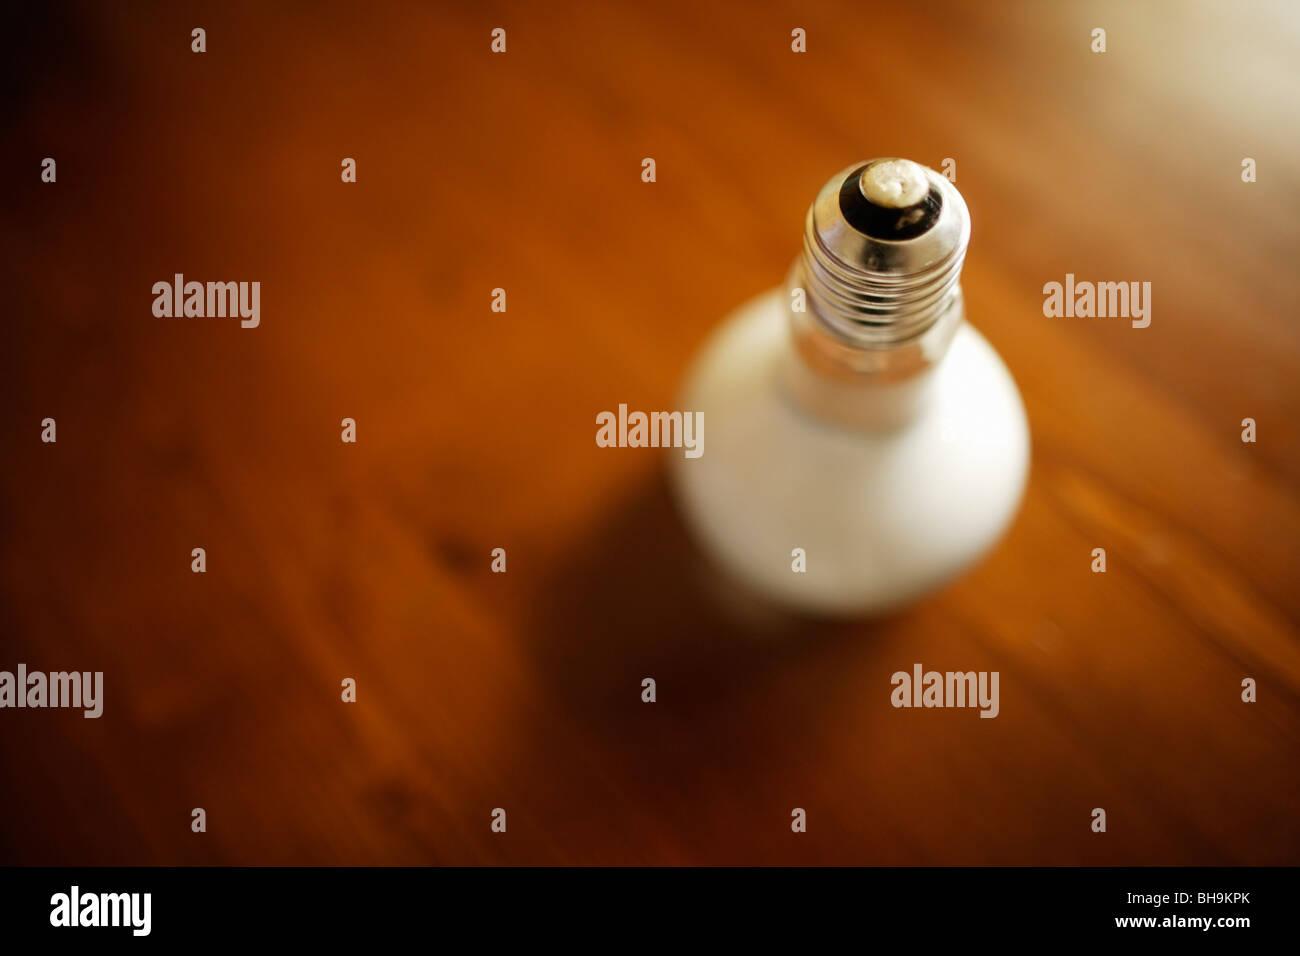 Screw fit light bulb - Stock Image